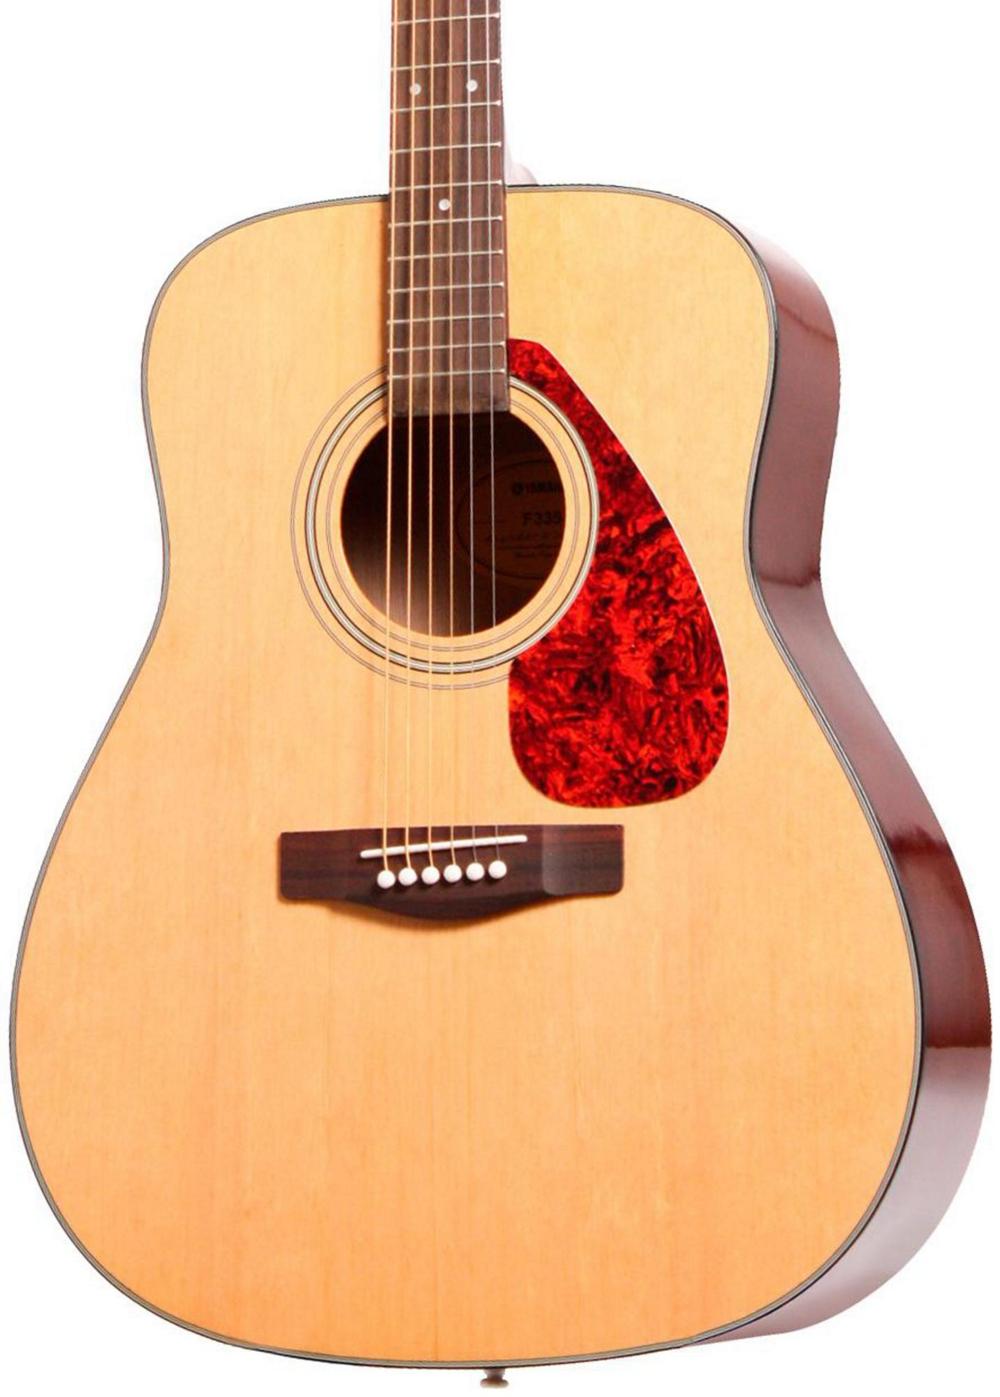 Yamaha f335 acoustic guitar natural 86792609942 ebay for Yamaha guitar brands